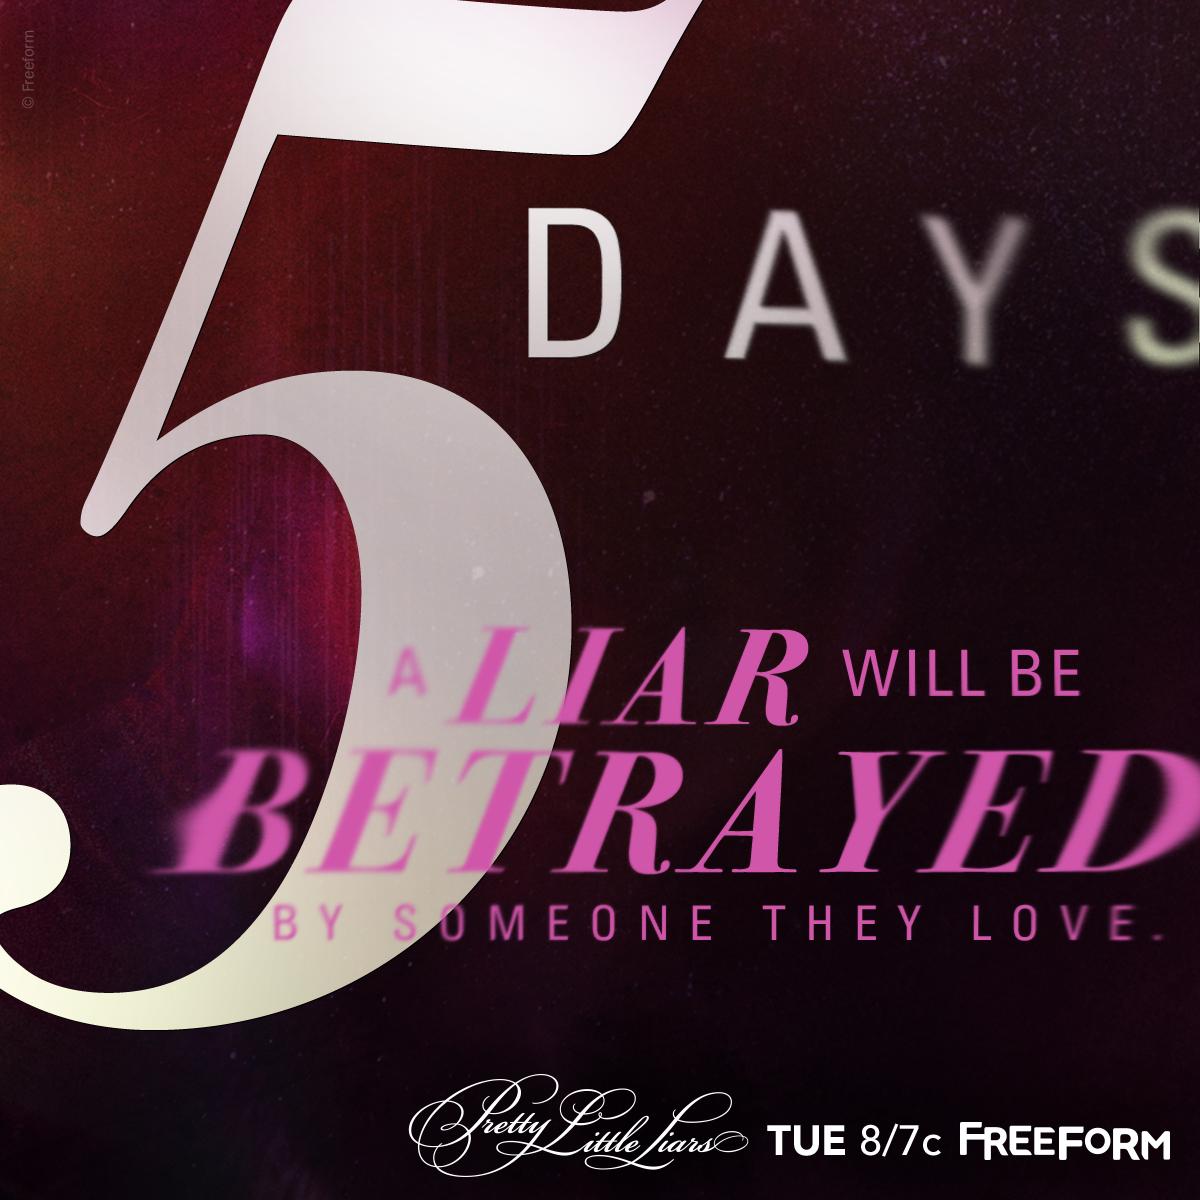 Pretty Little Liars - Here's What We Know Will Happen In The Pretty Little Liars Season 6 Finale! - 1004